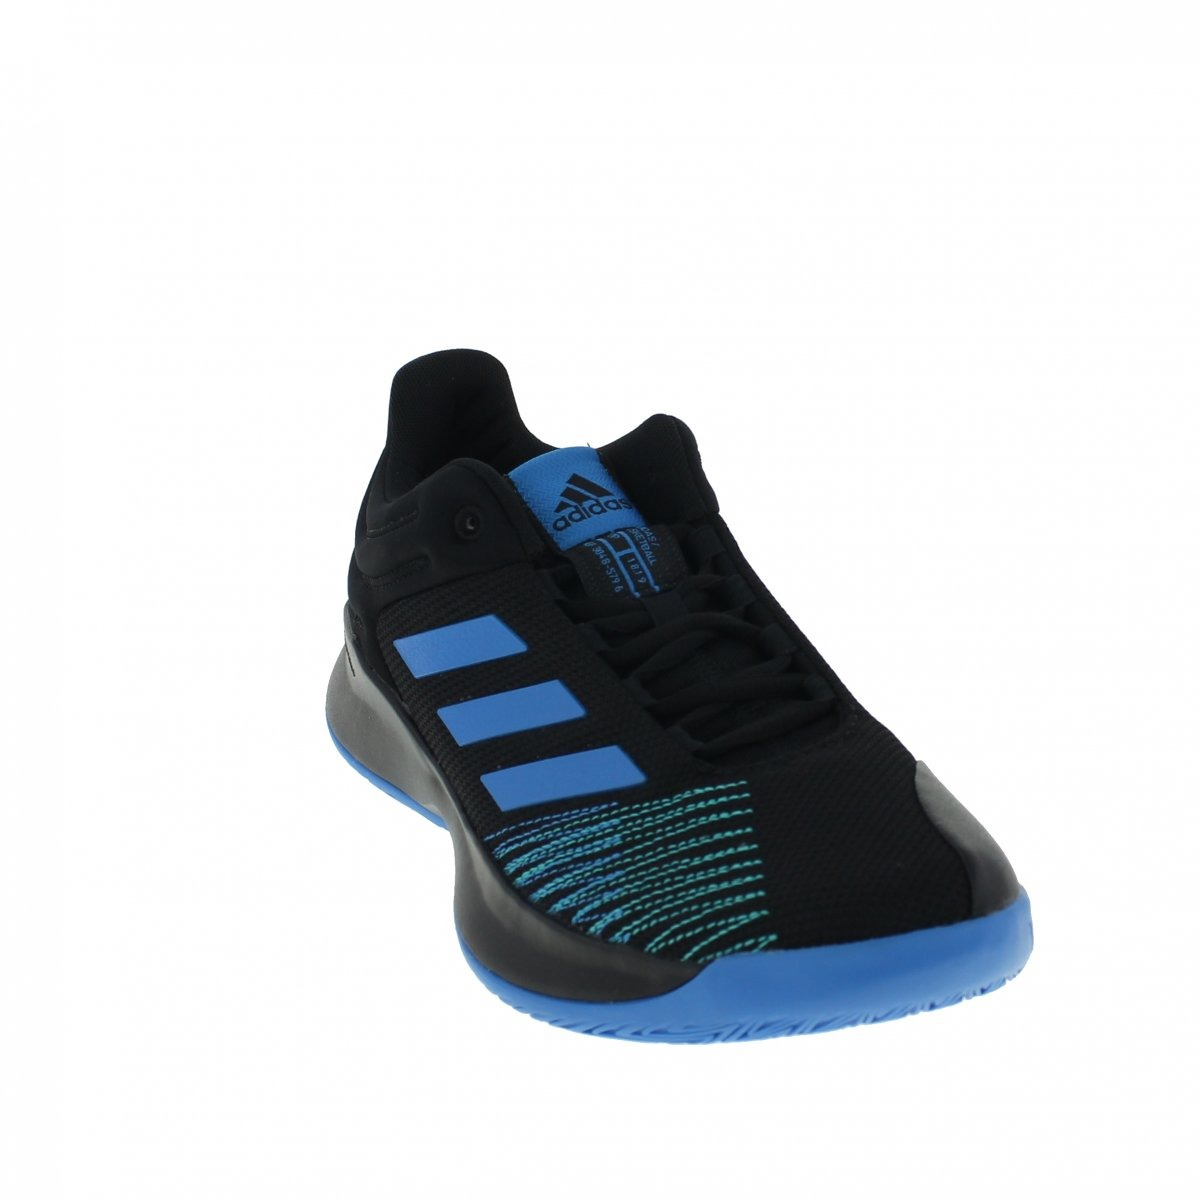 79360531083 Tenis adidas Pro Spark Low Masculino Basquete Original + Nf - R  299 ...